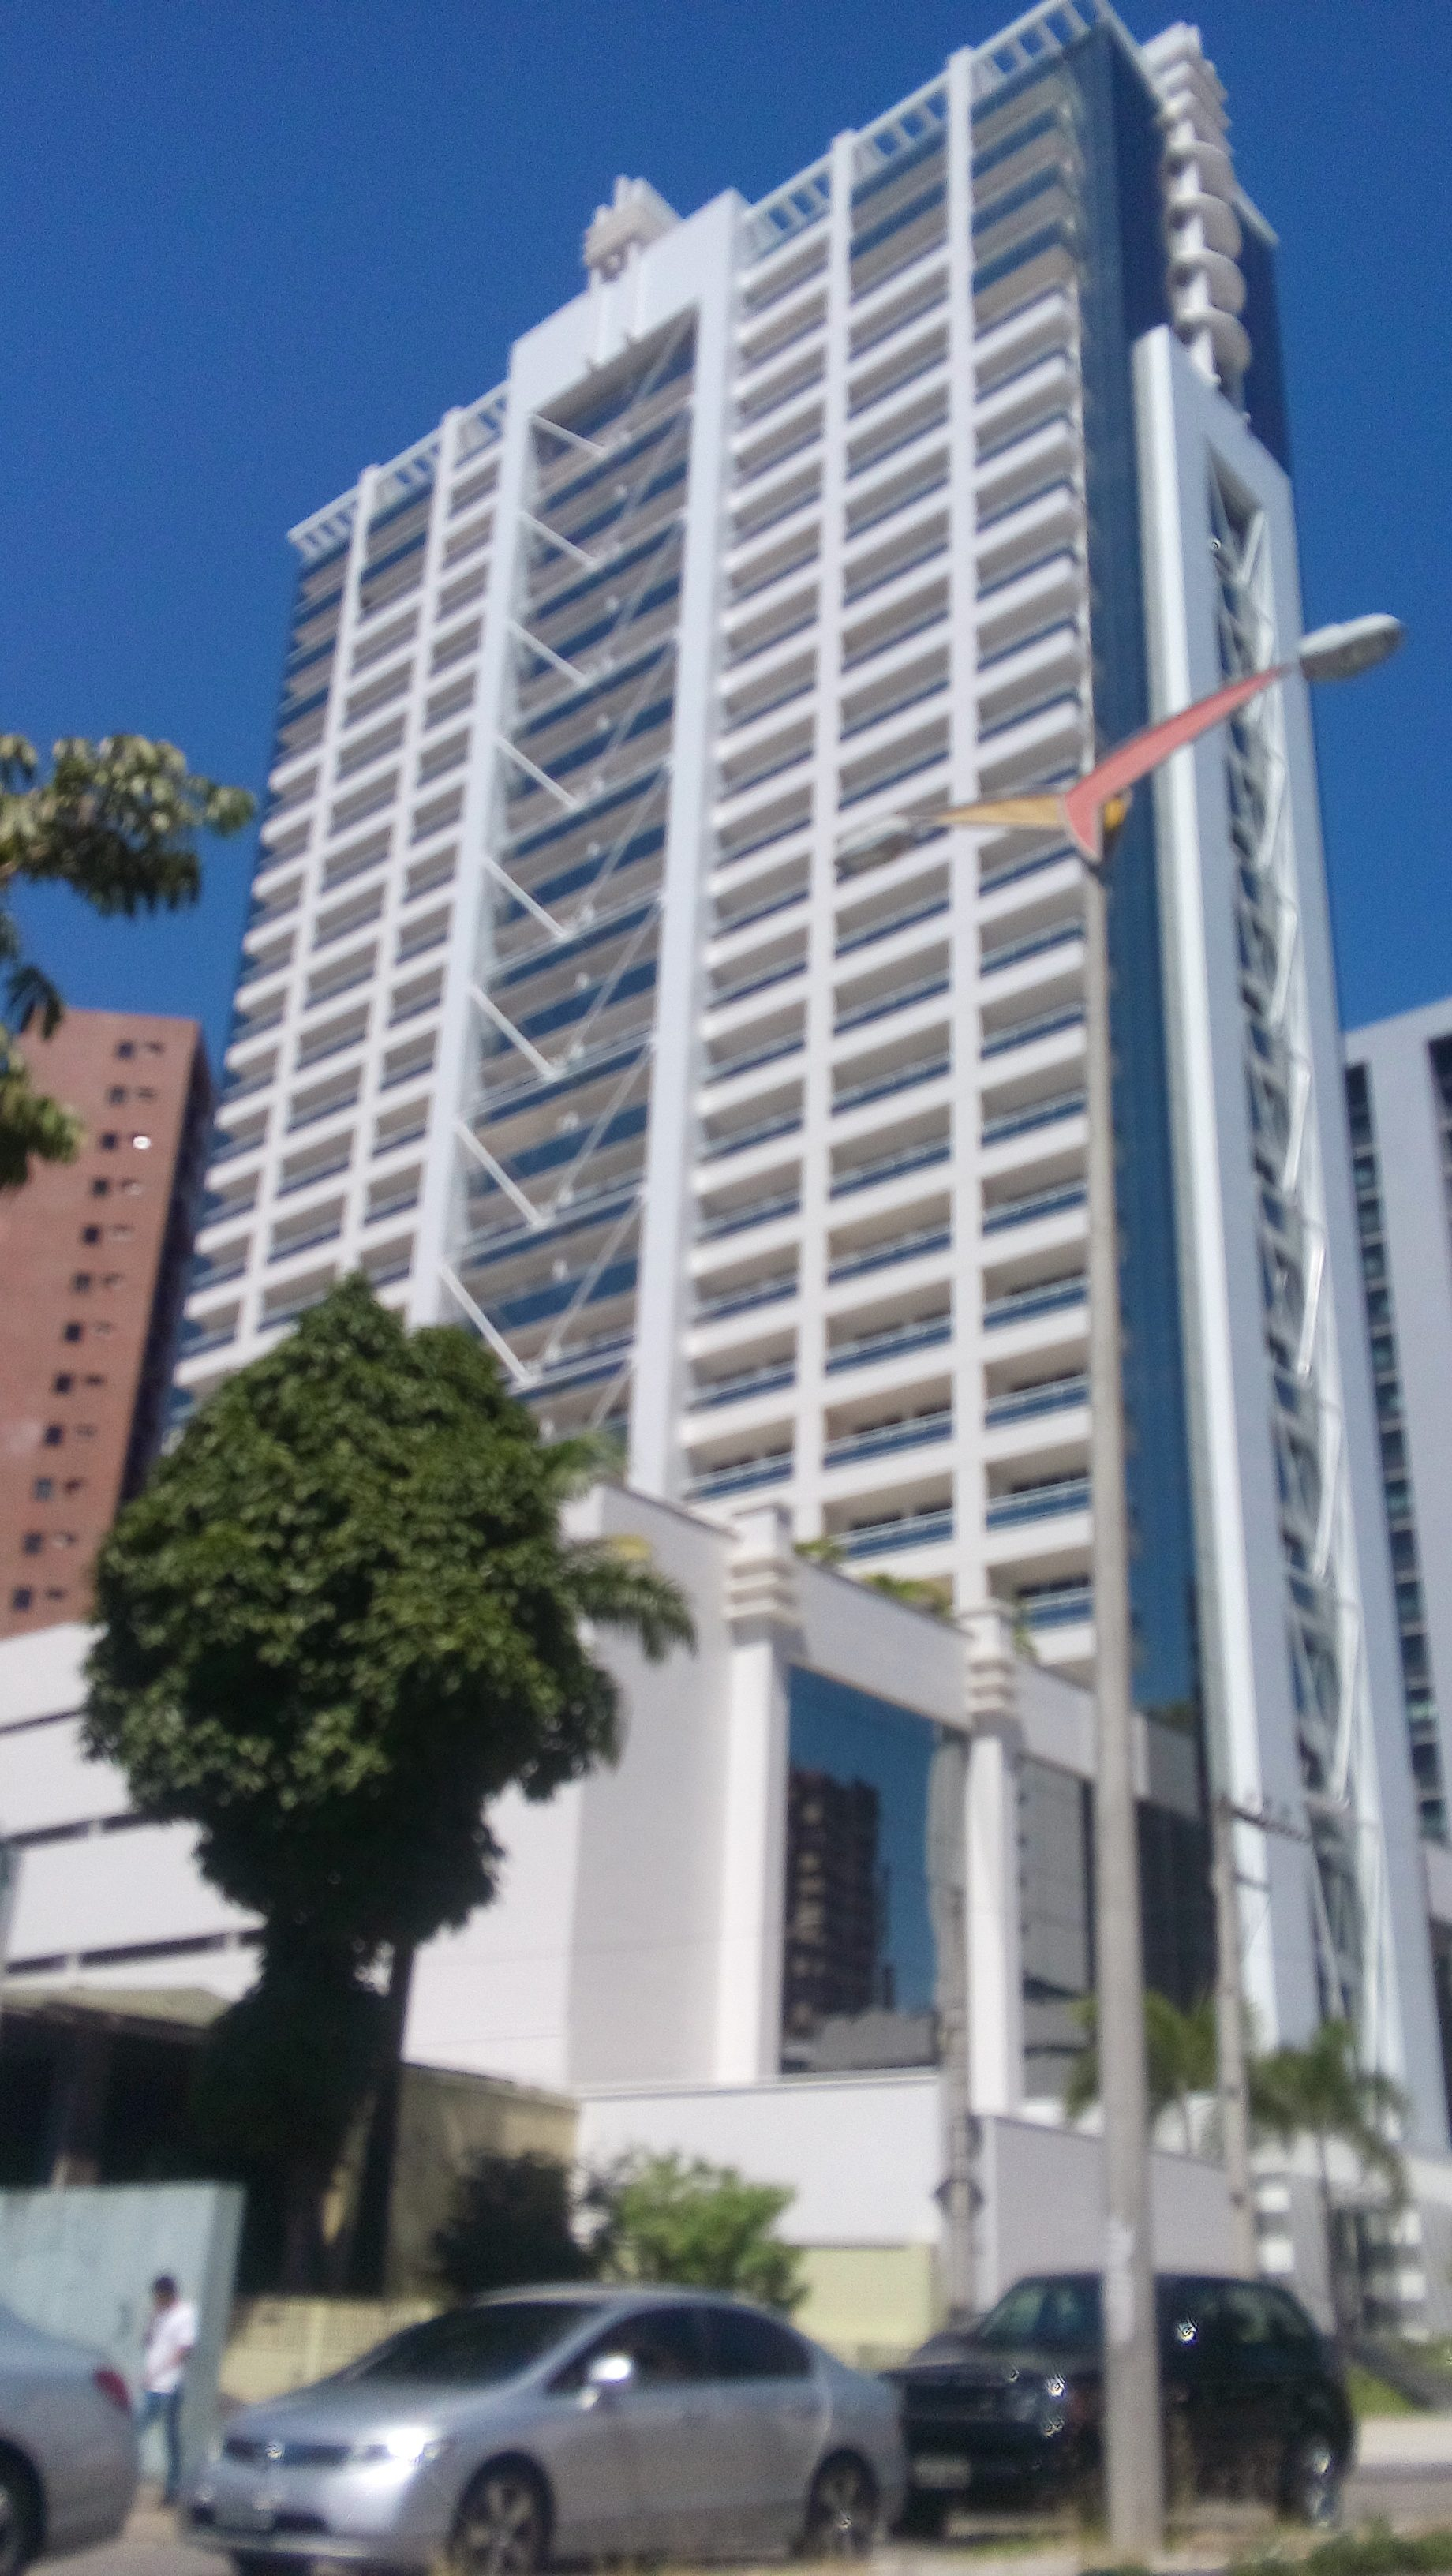 Sala Humberto Santana Business Cente